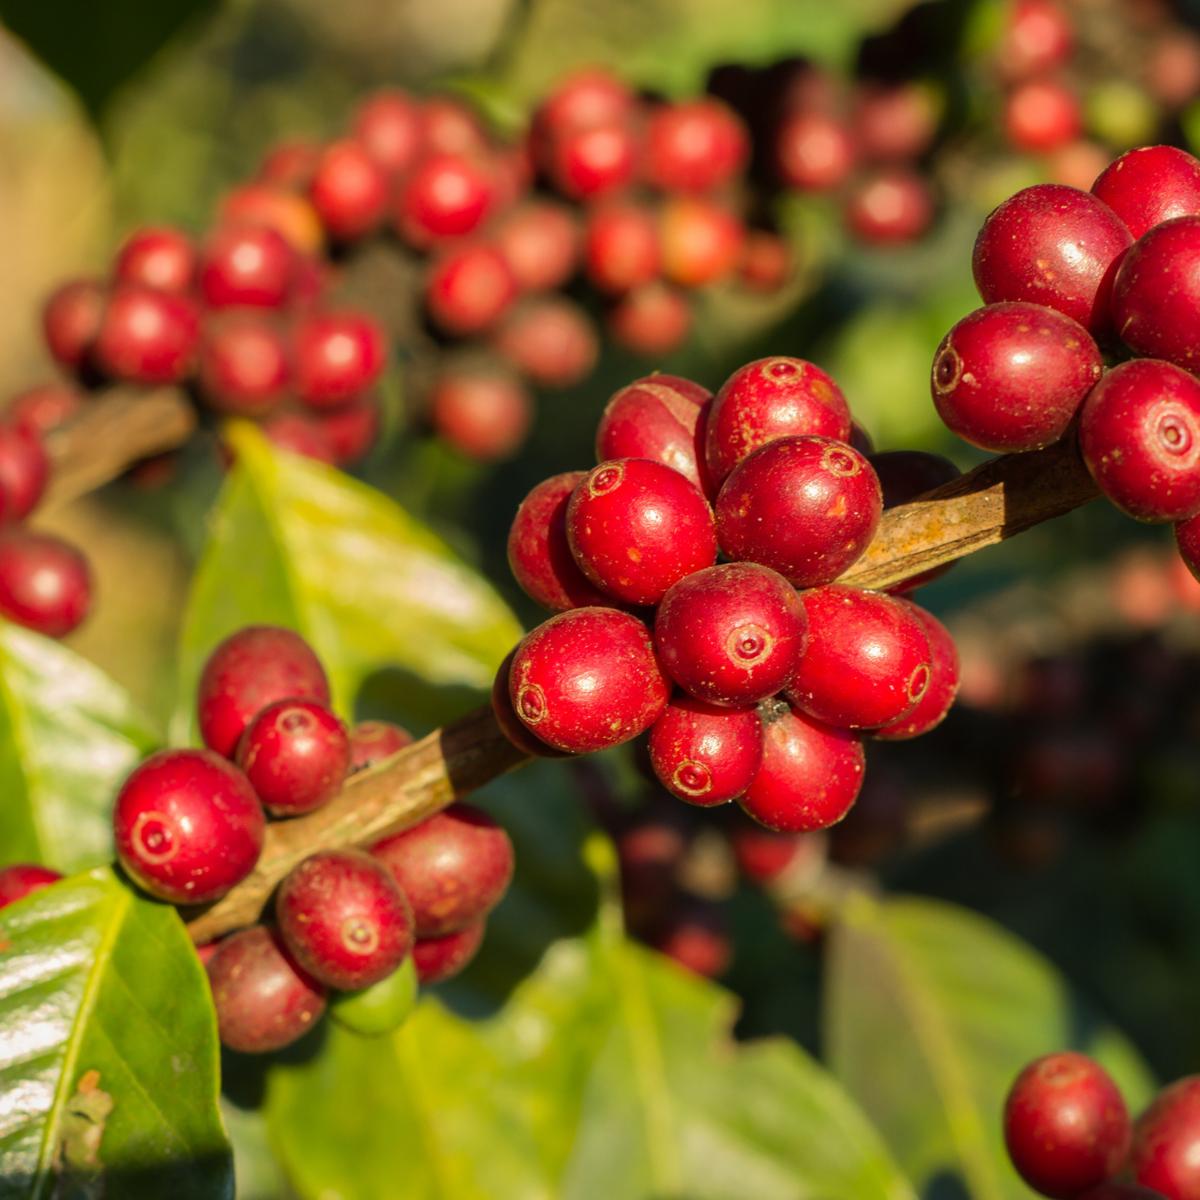 f:id:coffeetraveland:20210709000310p:plain